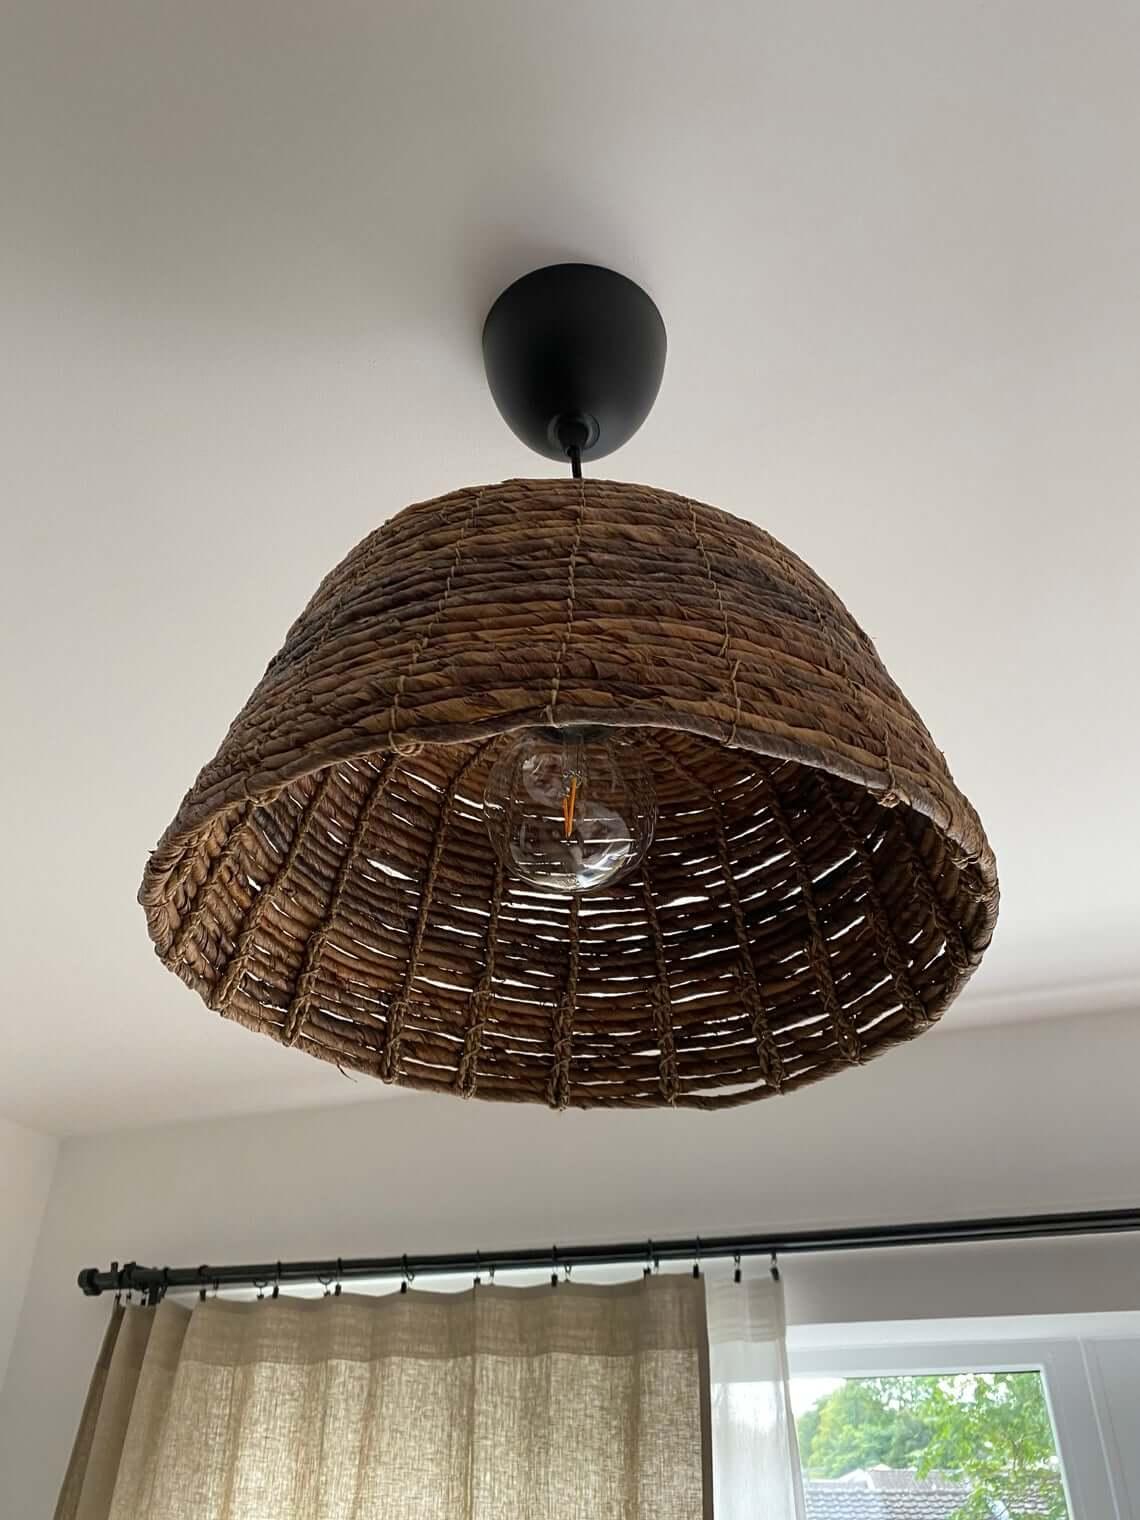 Cool Handmade Natural Rattan Lamp Shade